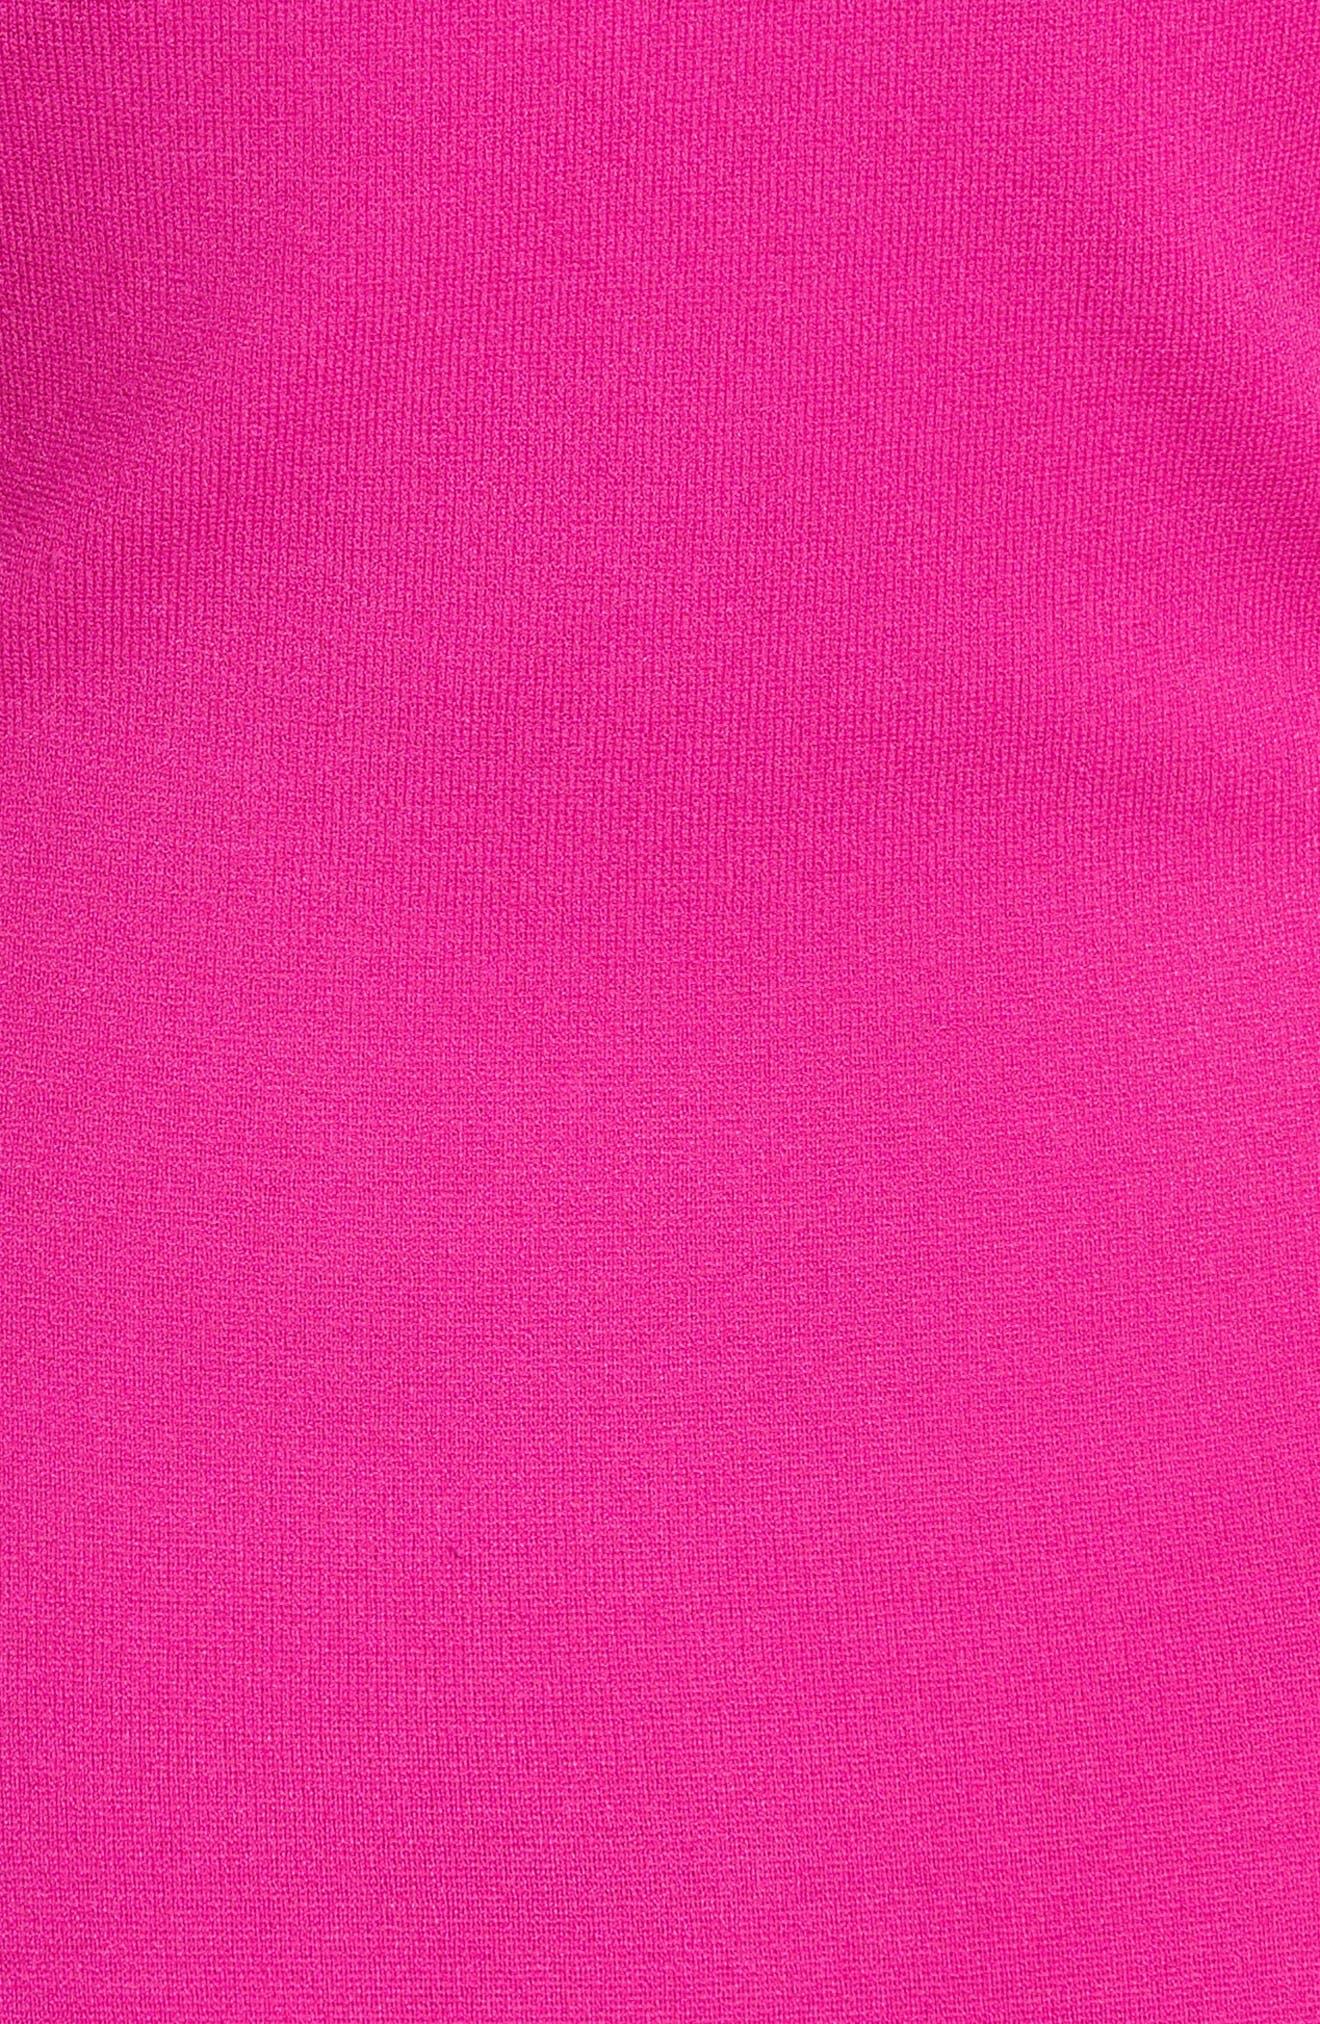 Diane von Furstenberg Knit One-Shoulder Midi Dress,                             Alternate thumbnail 5, color,                             666